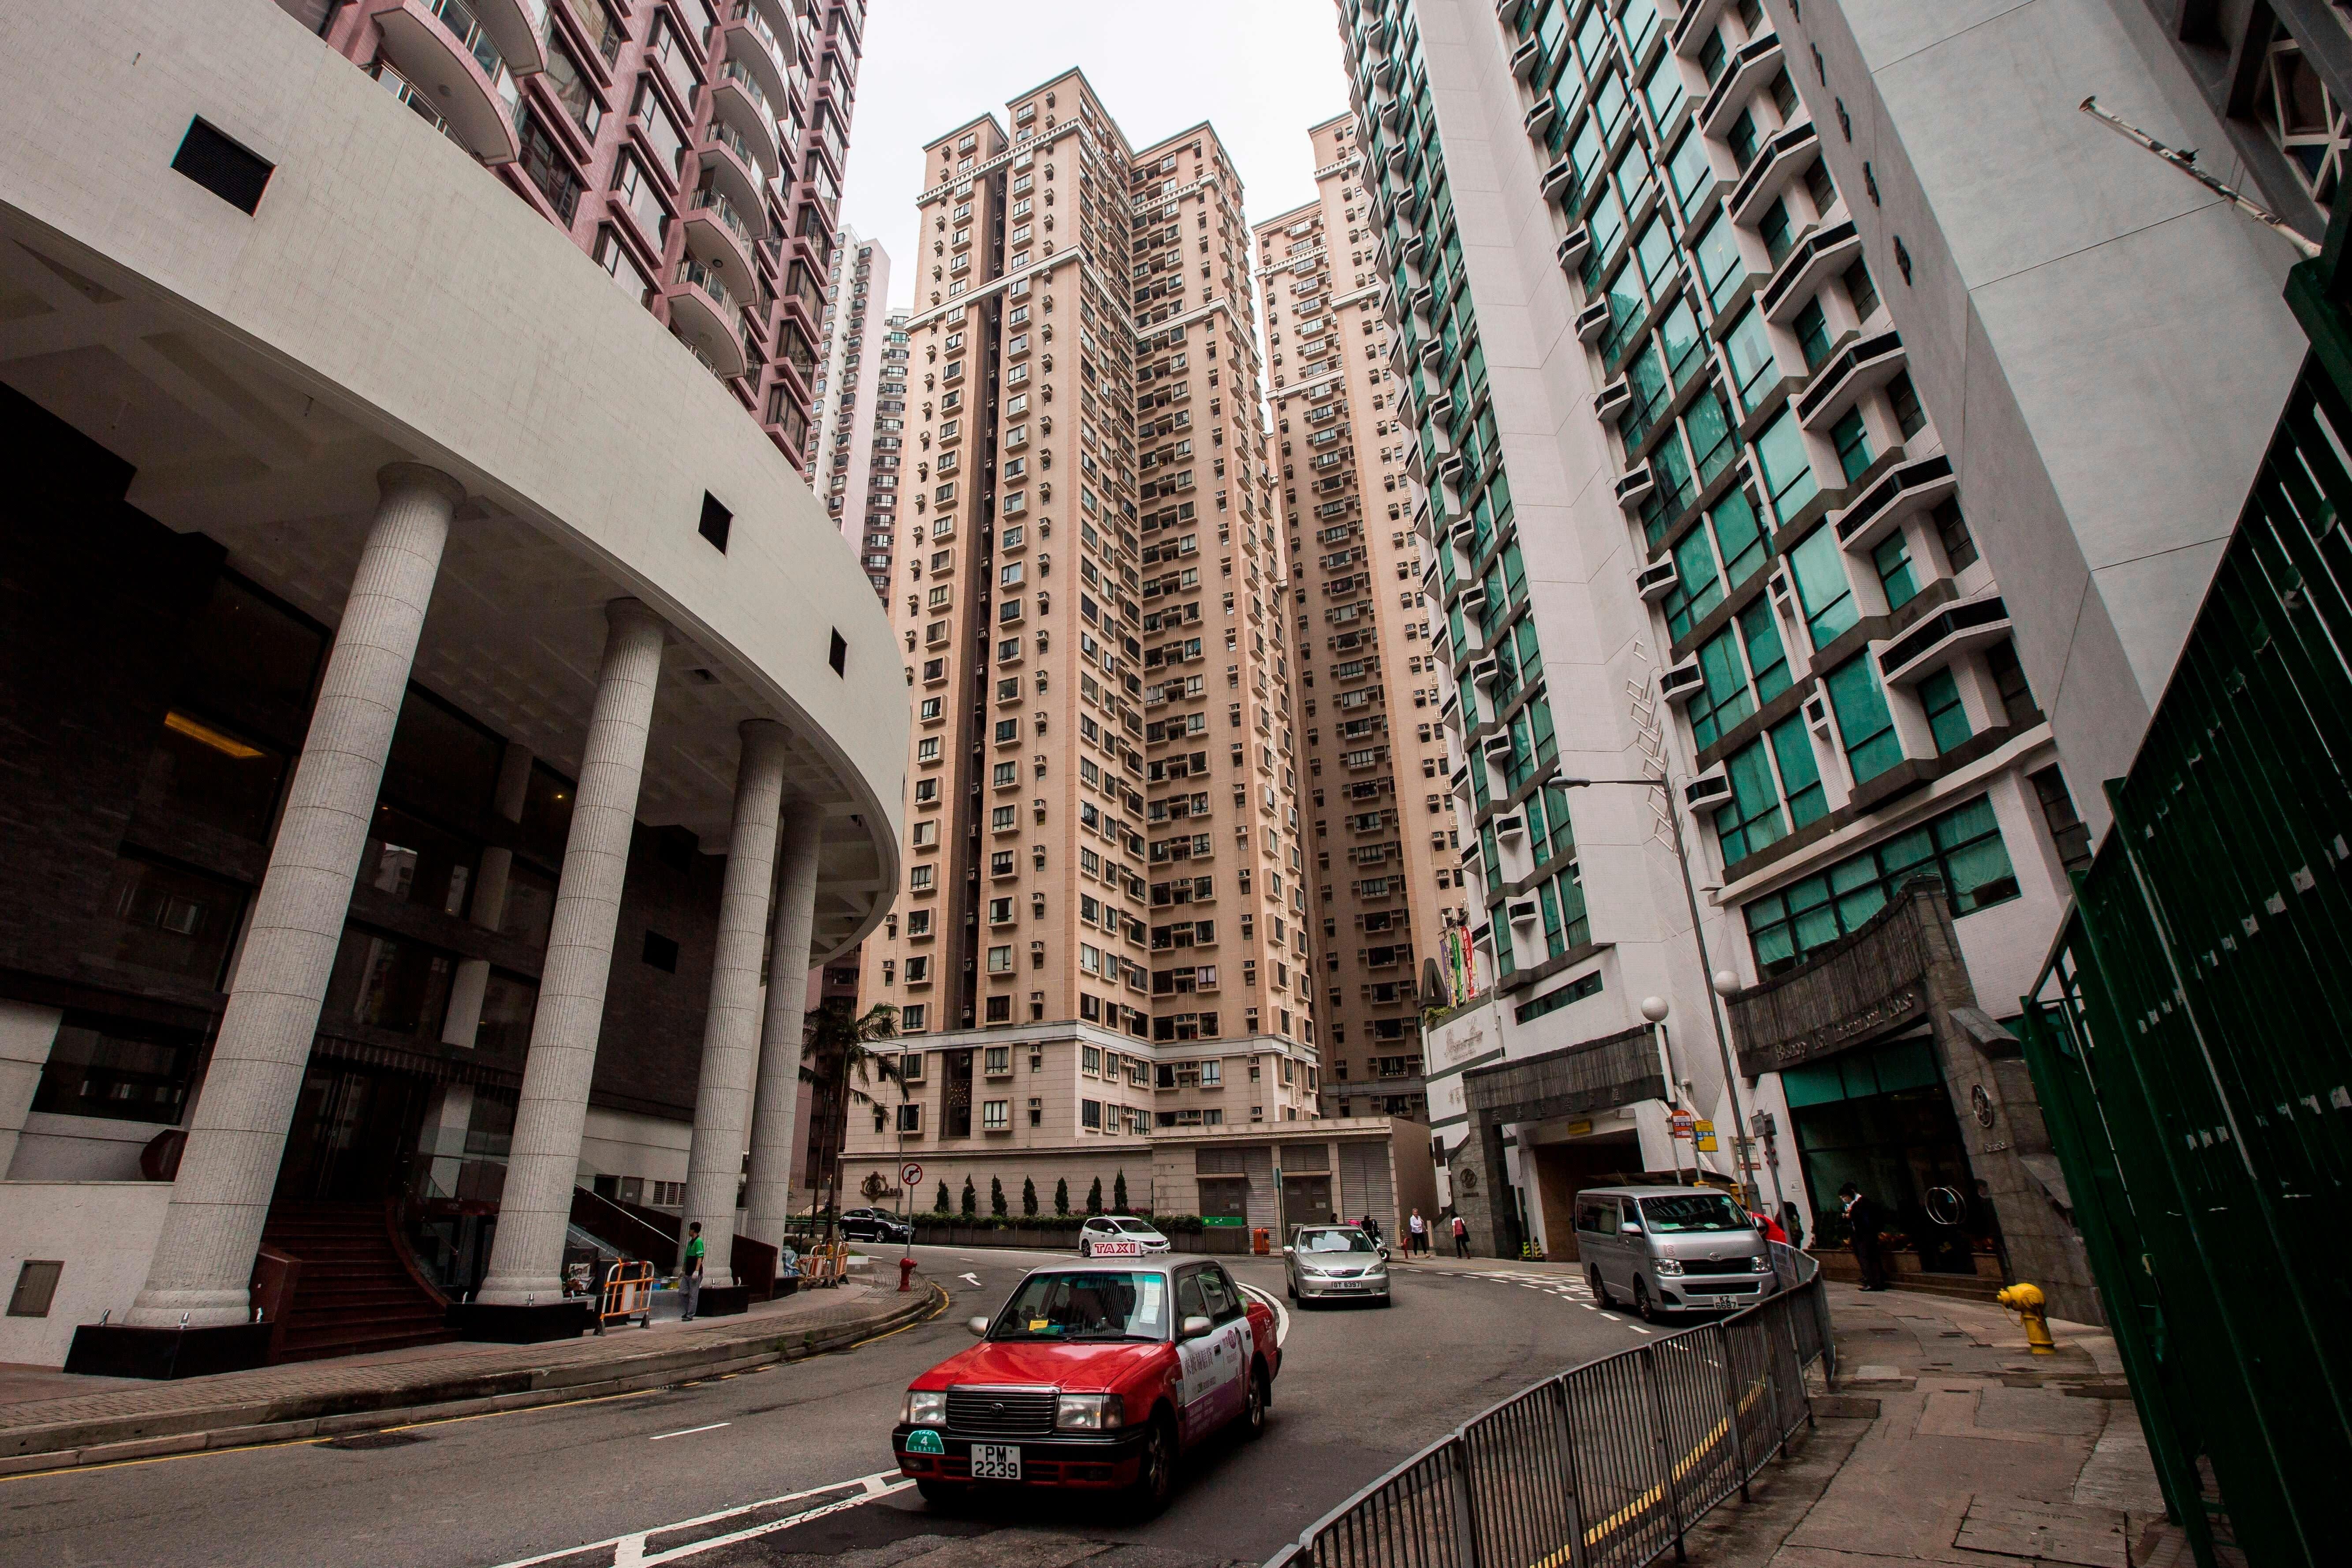 Sky-high Hong Kong home prices may not last as trade war bites